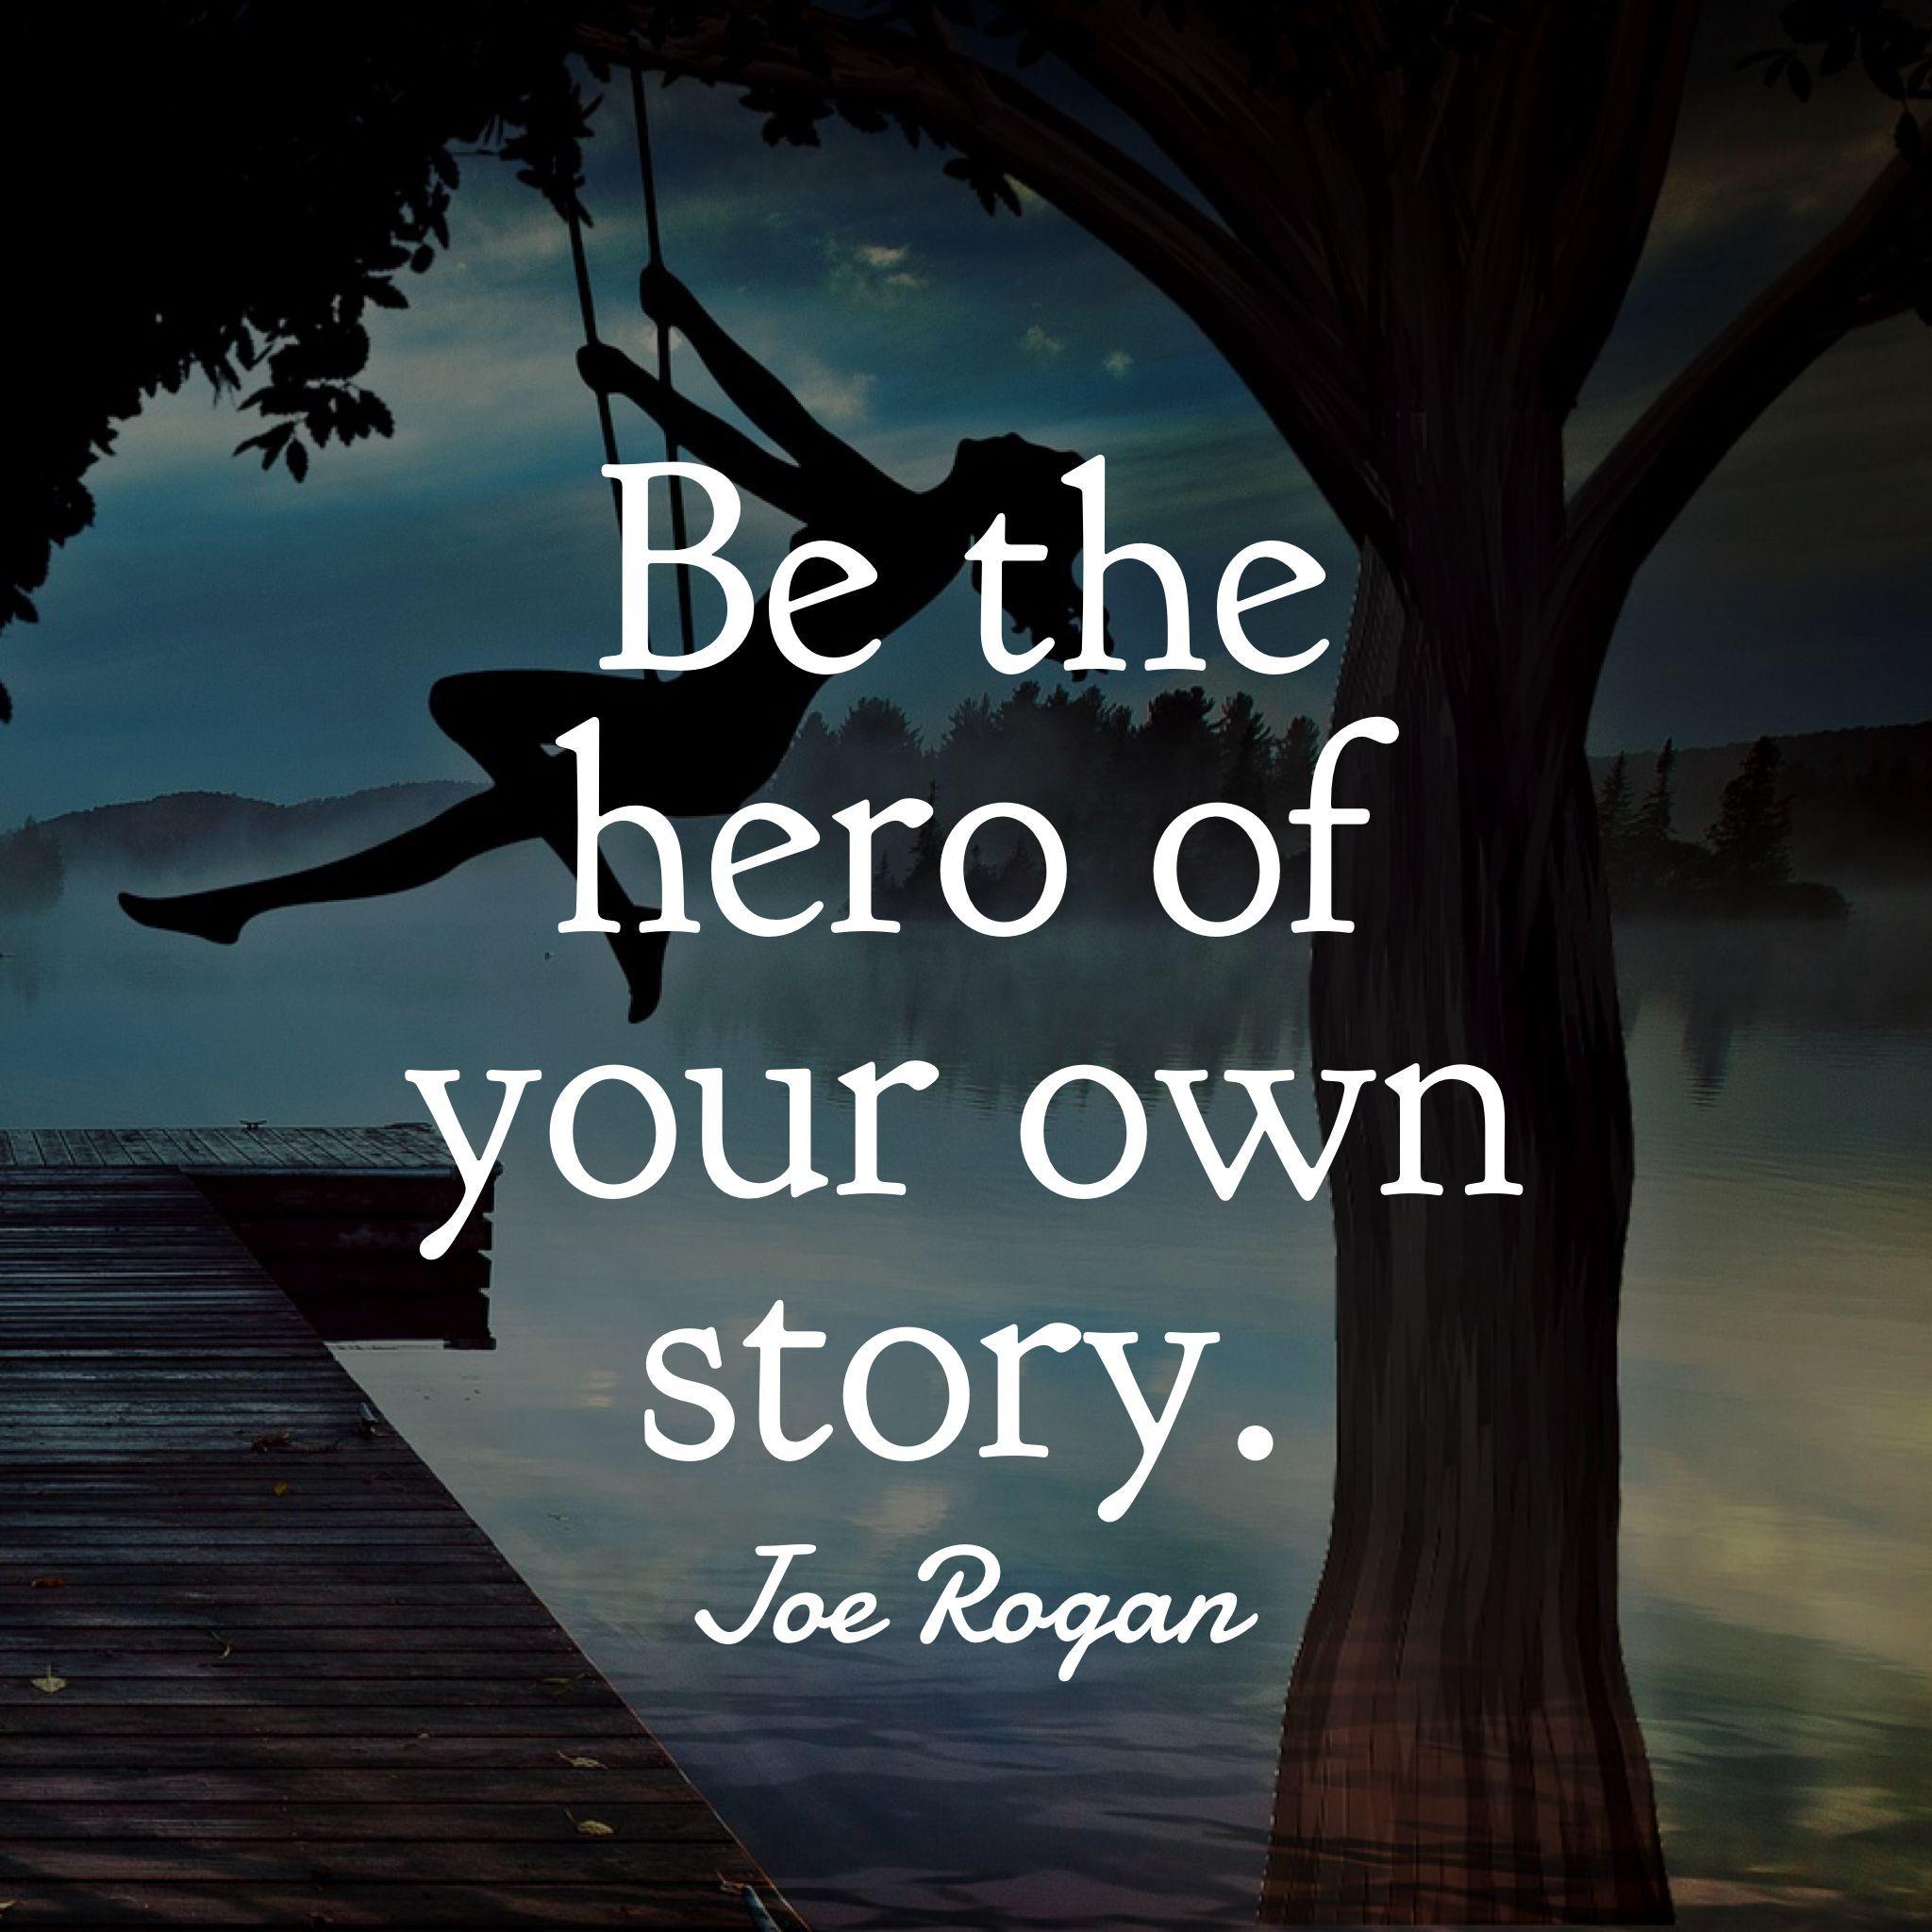 21 Highly Motivational Joe Rogan Quotes Joe Rogan Quotes Motivation Quotes